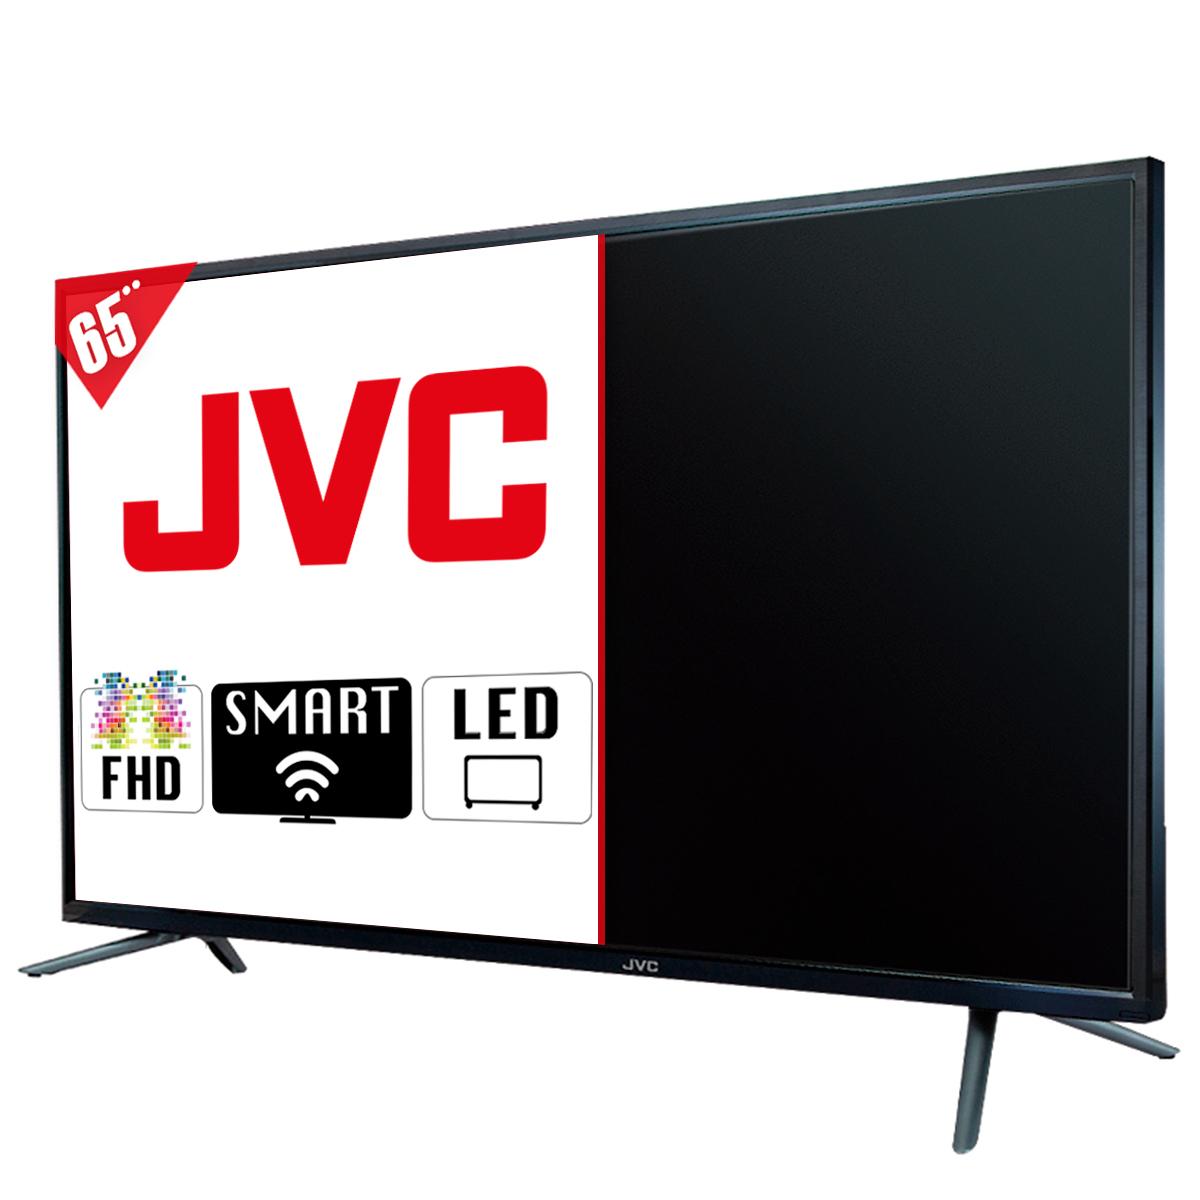 Office Depot: PANTALLA JVC SI65FS (65 PULG., FHD, SMART TV)